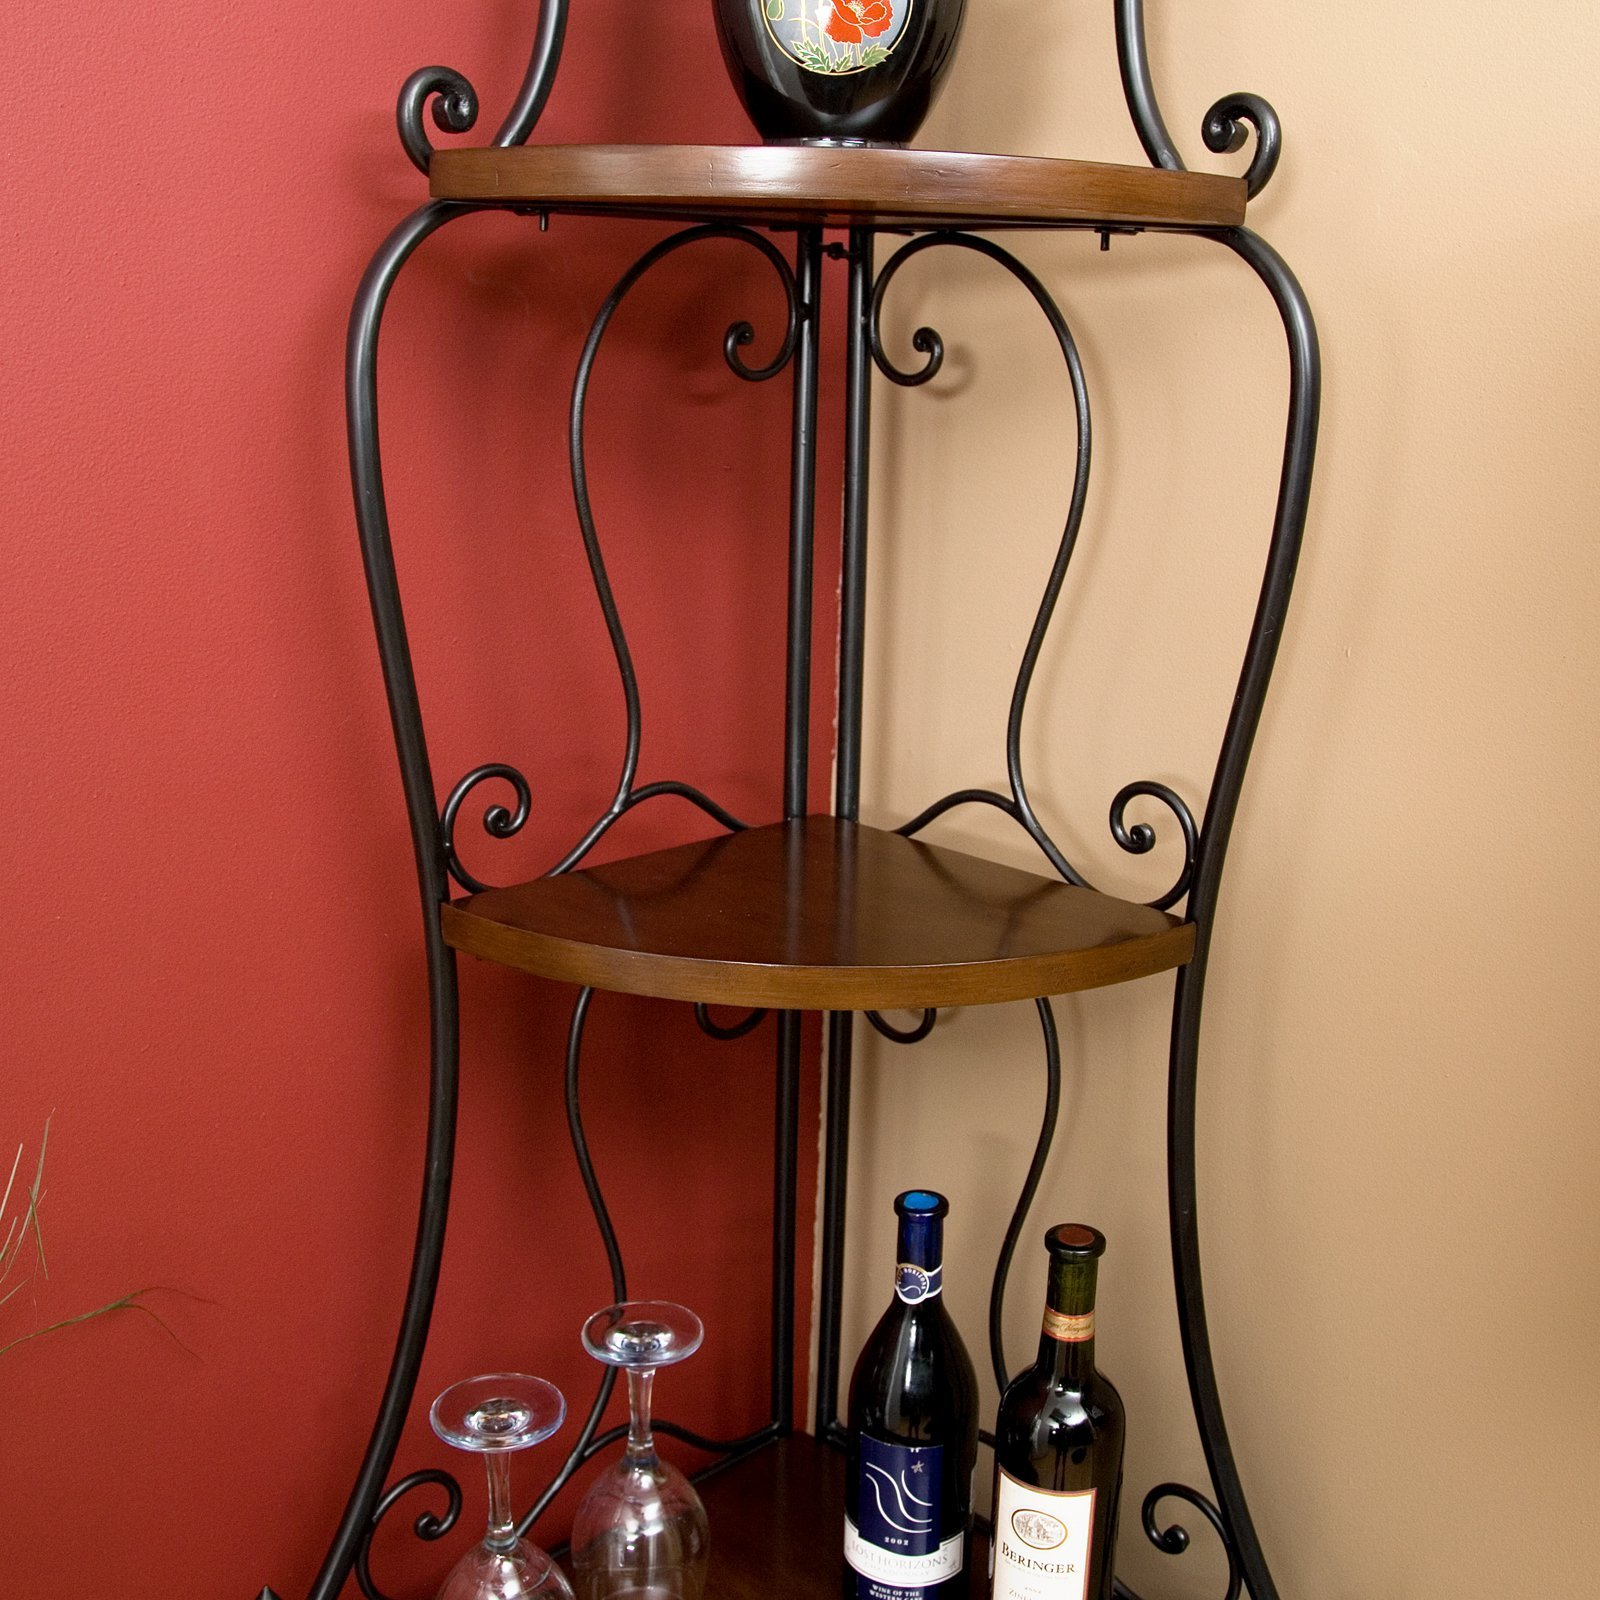 Wrought Iron Corner Bakers Rack with Wood Shelves, Heritage Oak Finish by Belham Living (Image #3)